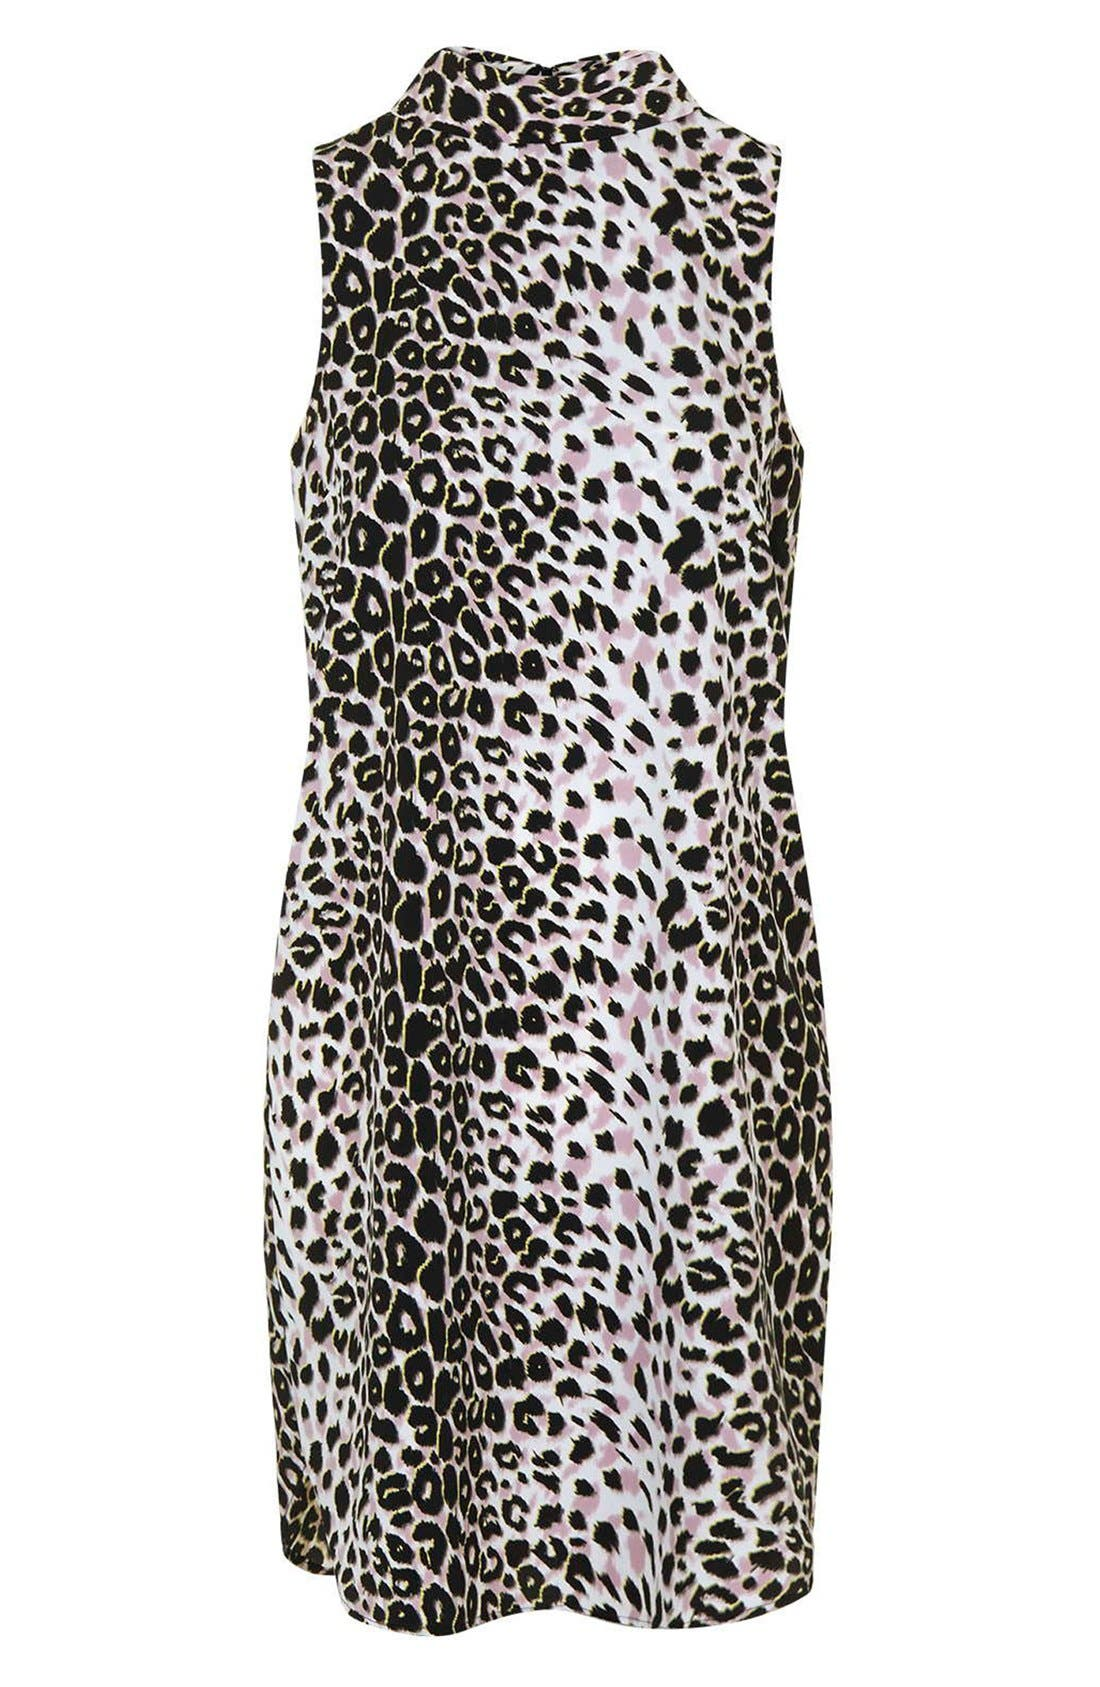 Leopard Print Funnel Neck Tunic Dress,                             Alternate thumbnail 4, color,                             Grey Multi